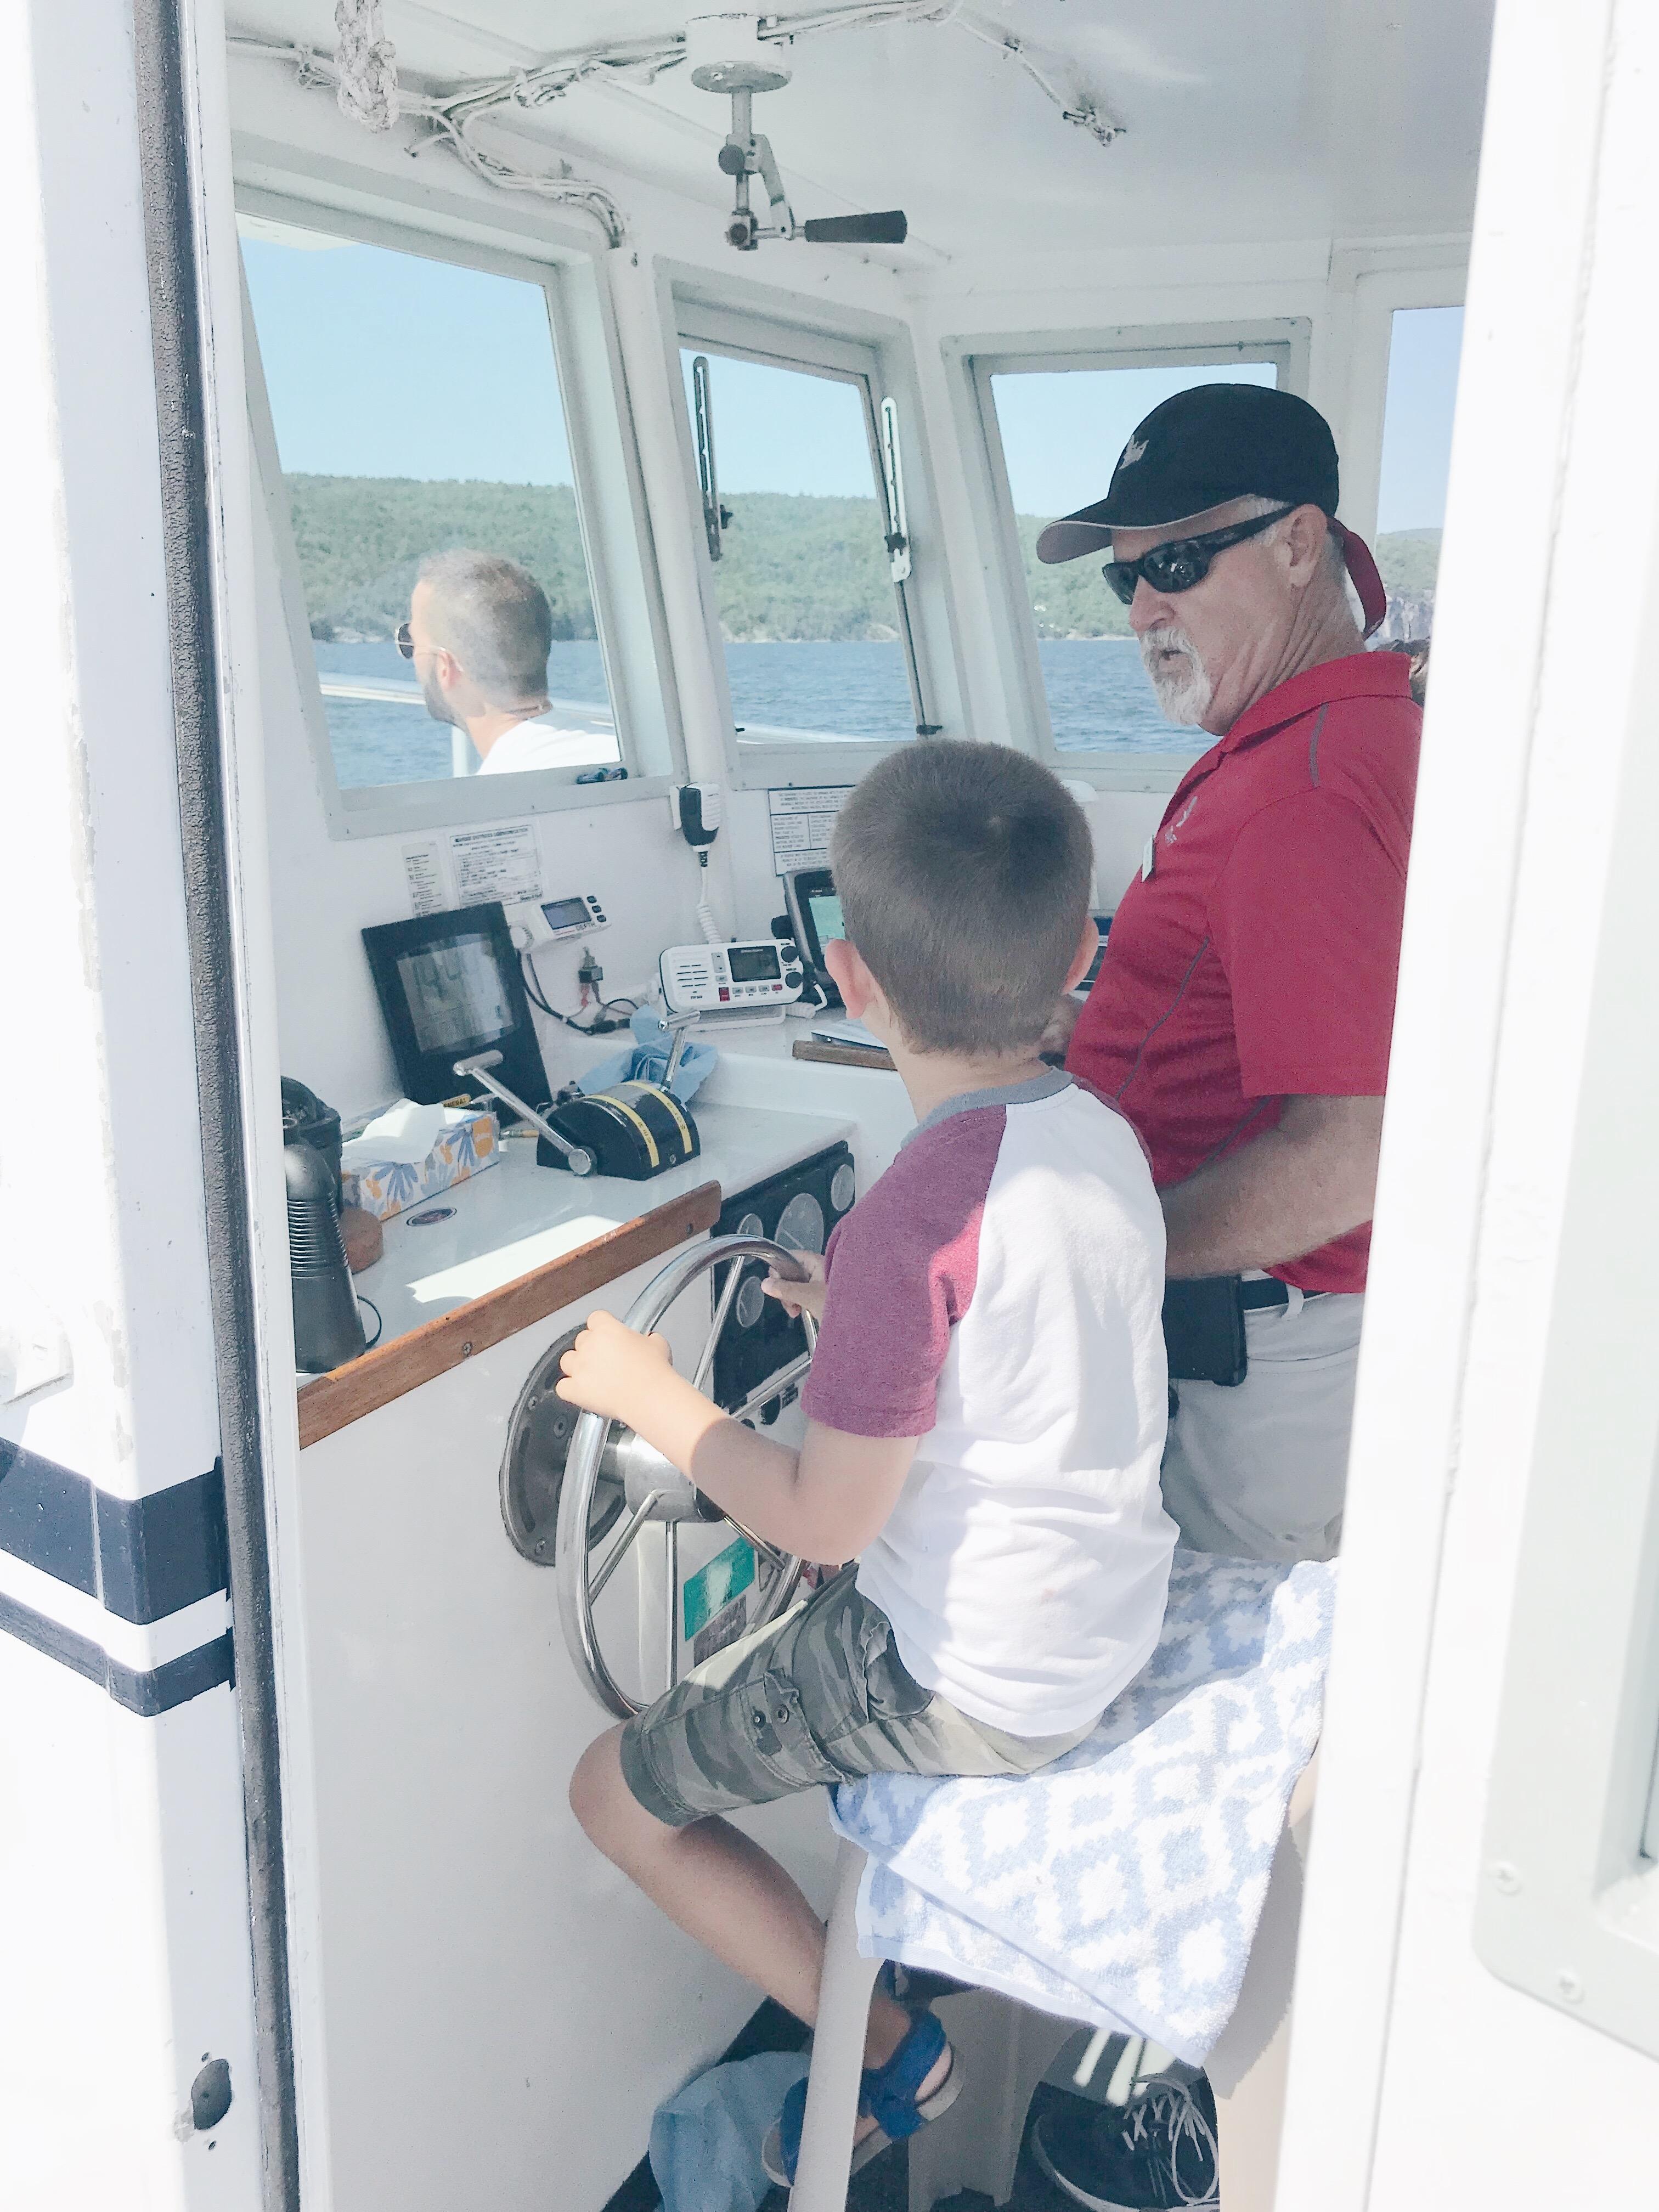 Basin Harbor Resort Review - Driving the Boat